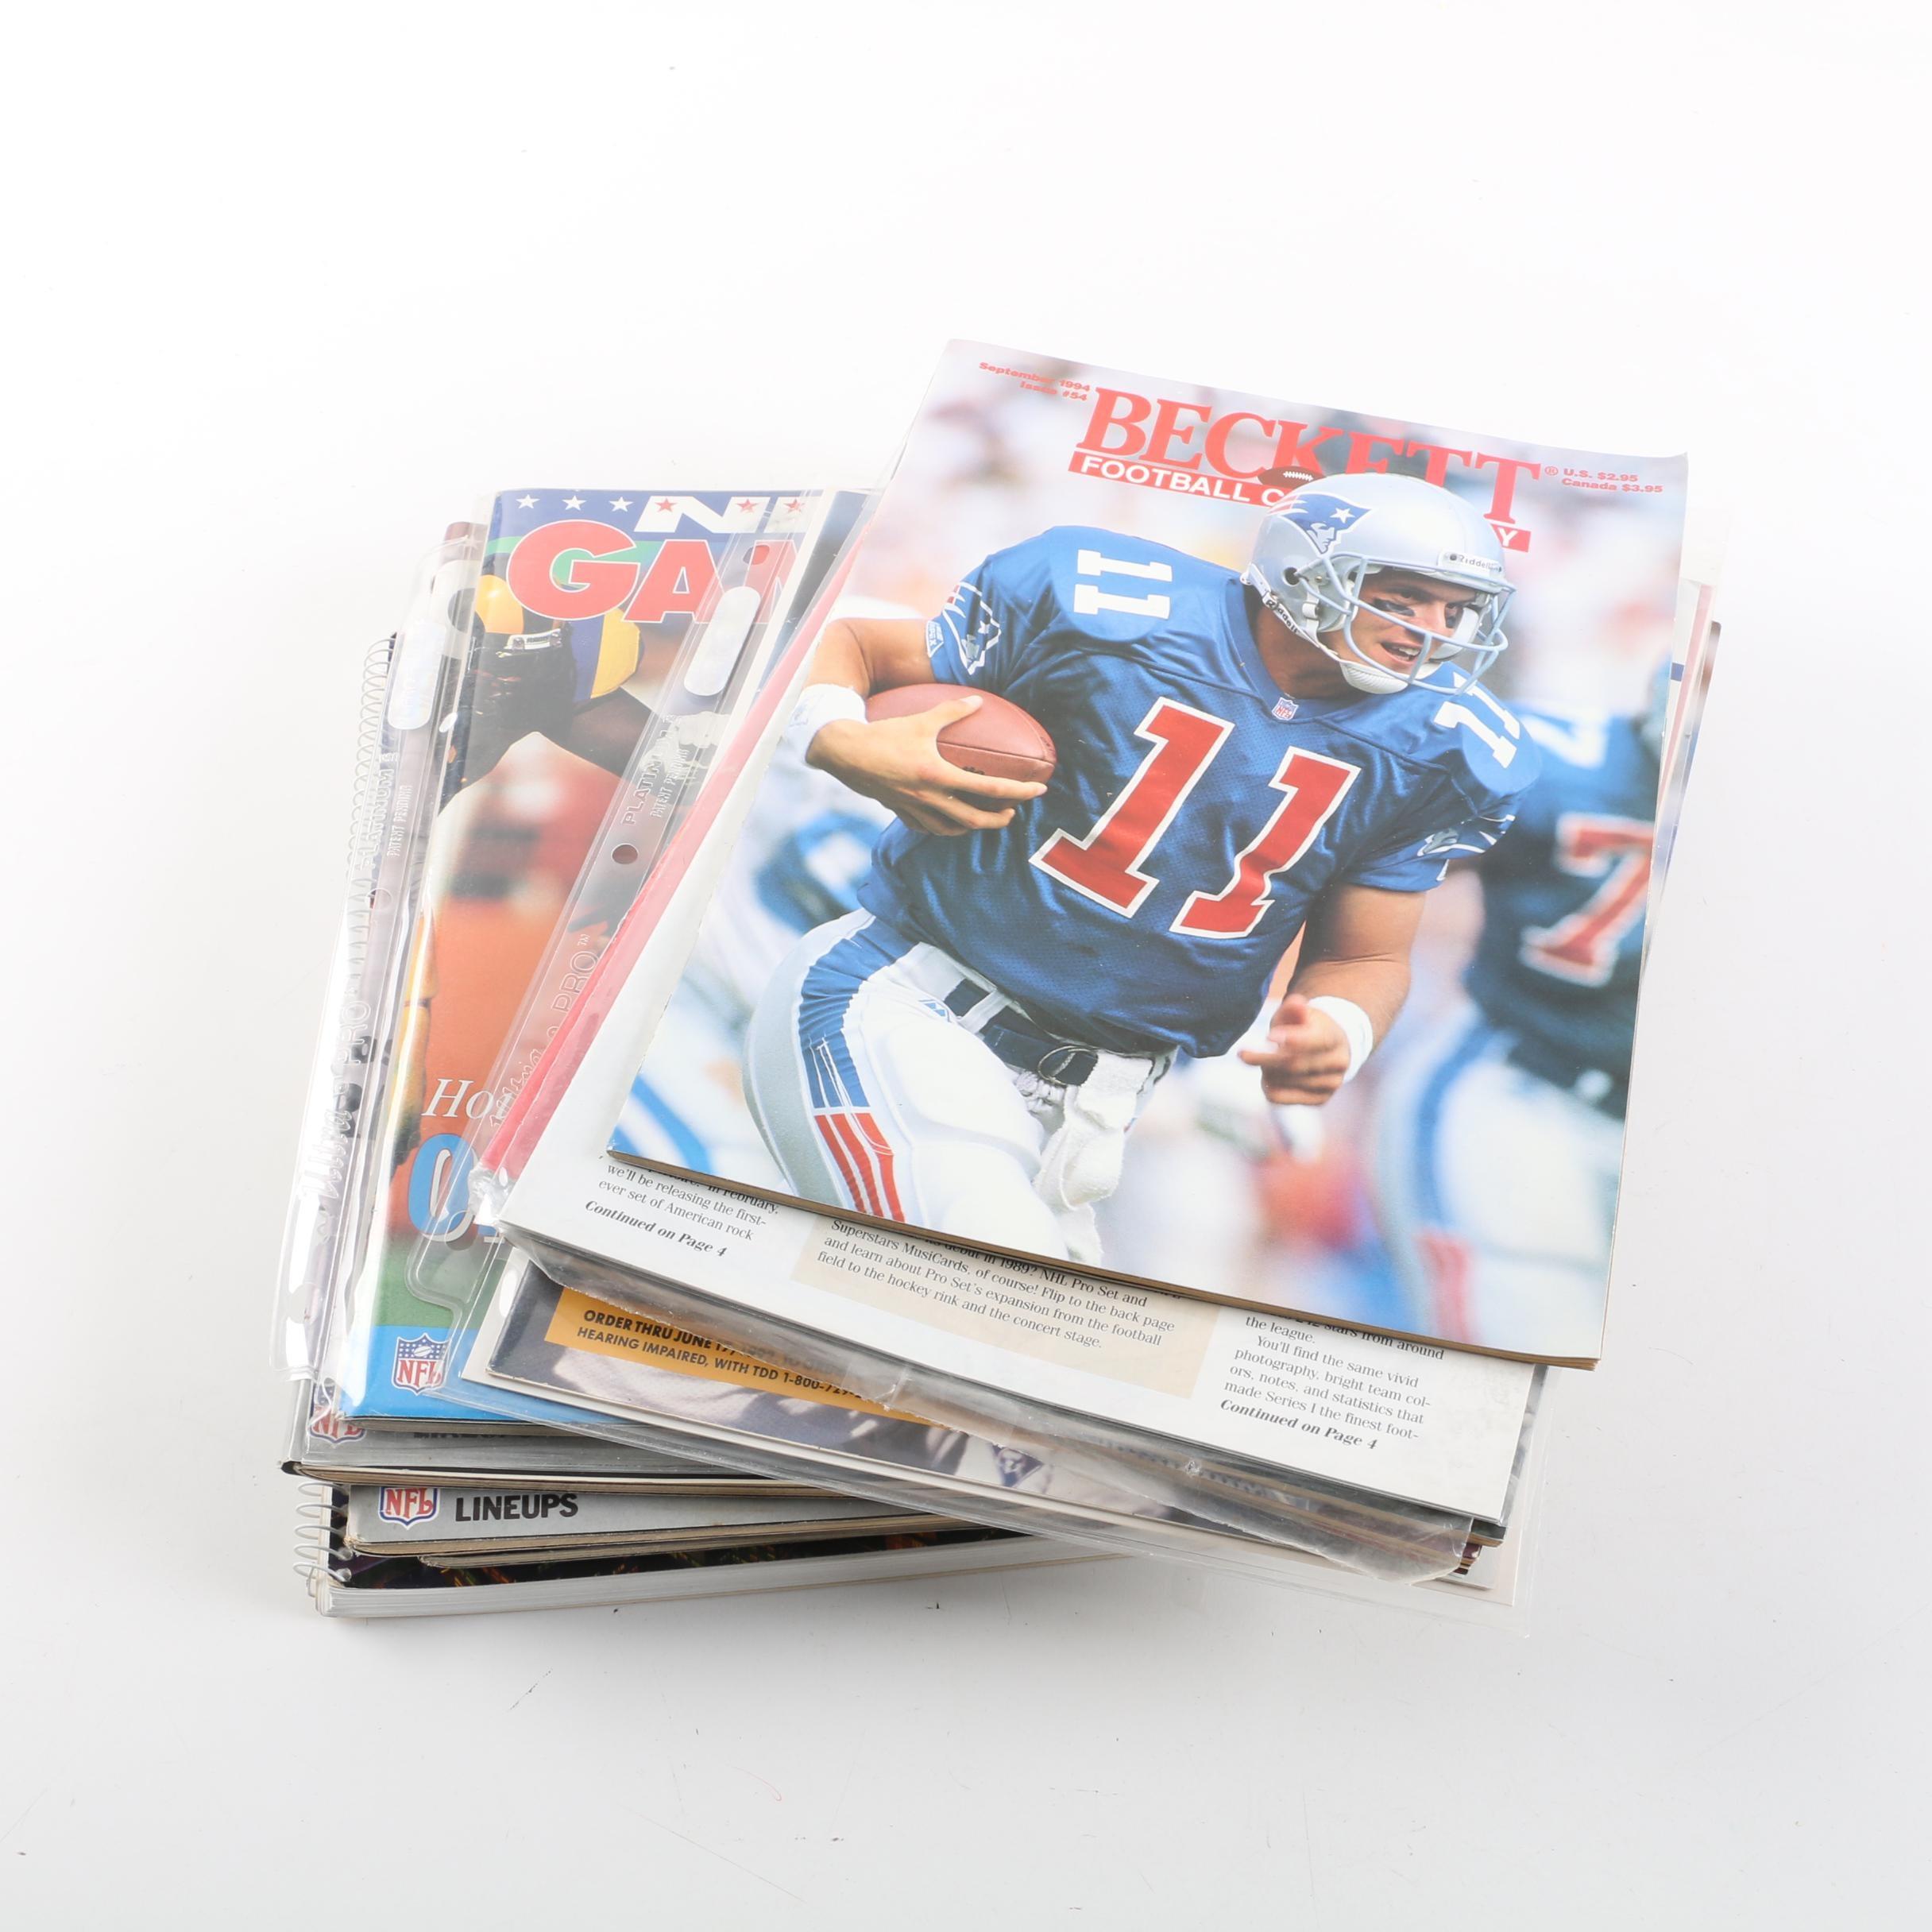 1990s Football Magazines